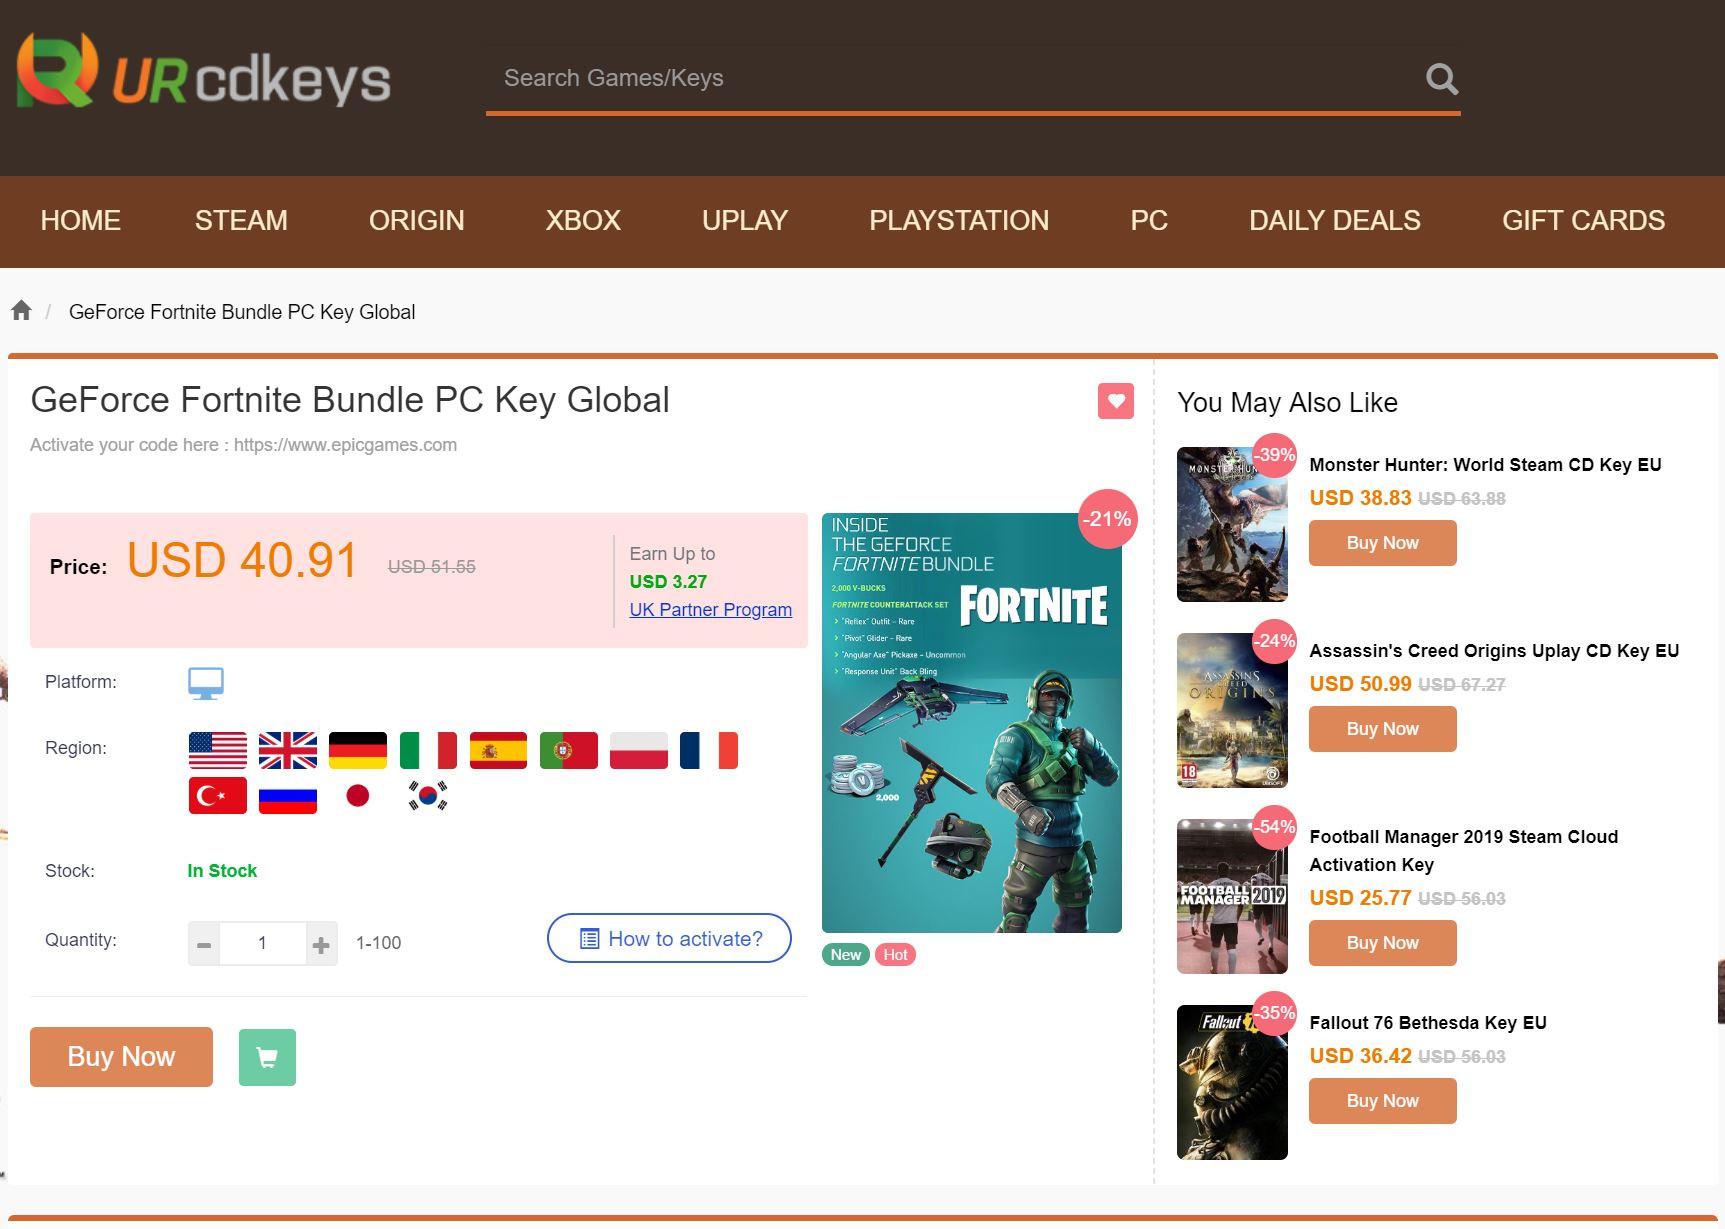 URCDKeys Brings You the Summer Vacation Sale: Windows 10 Pro OEM